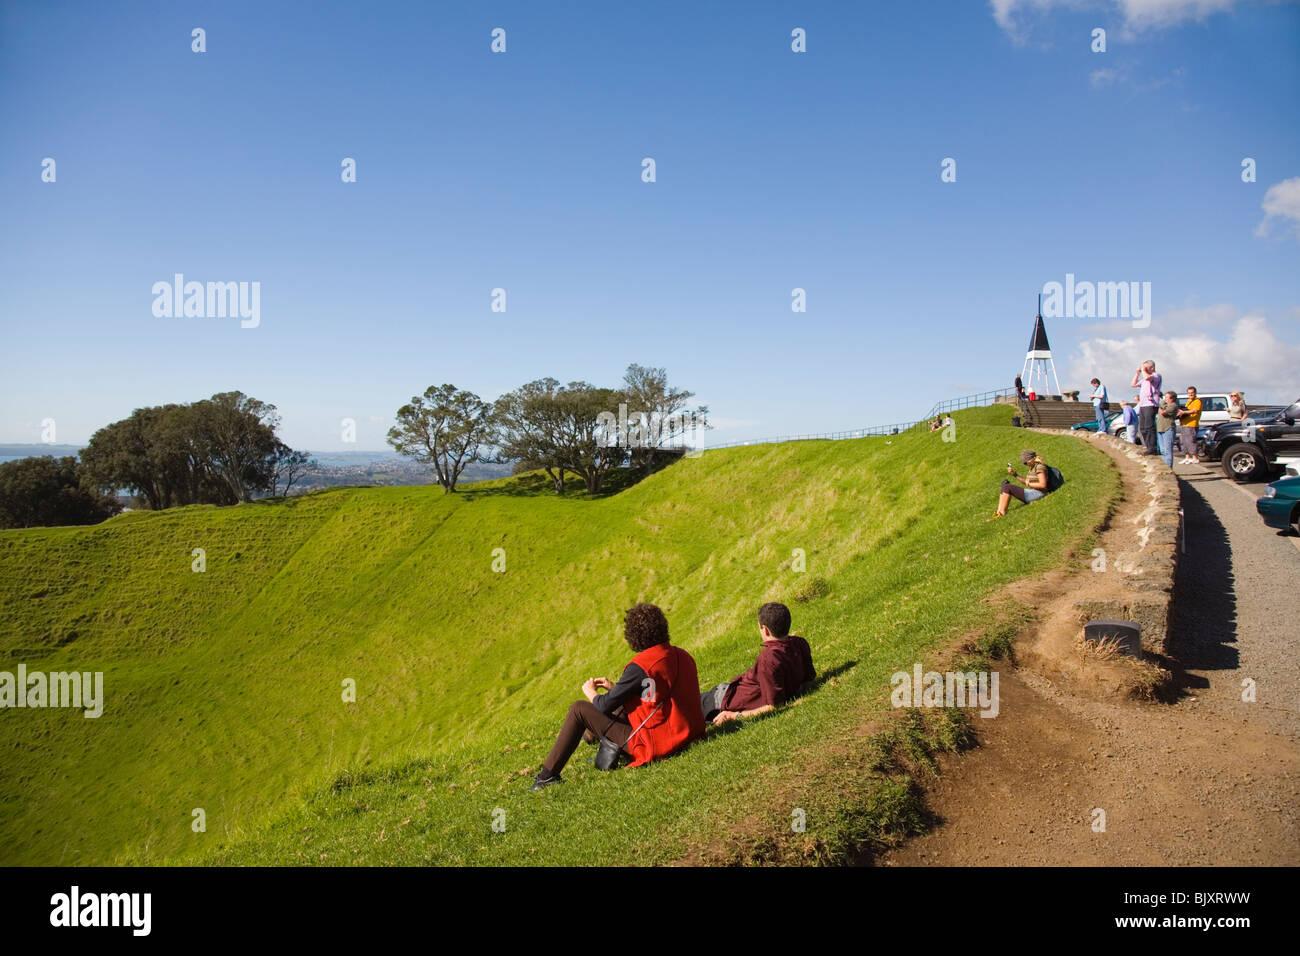 Touristen auf Mount Eden Domain (Maungawhau) Gipfel-Parkplatz am ruhenden Vulkankrater. Auckland-Nordinsel Neuseeland Stockbild